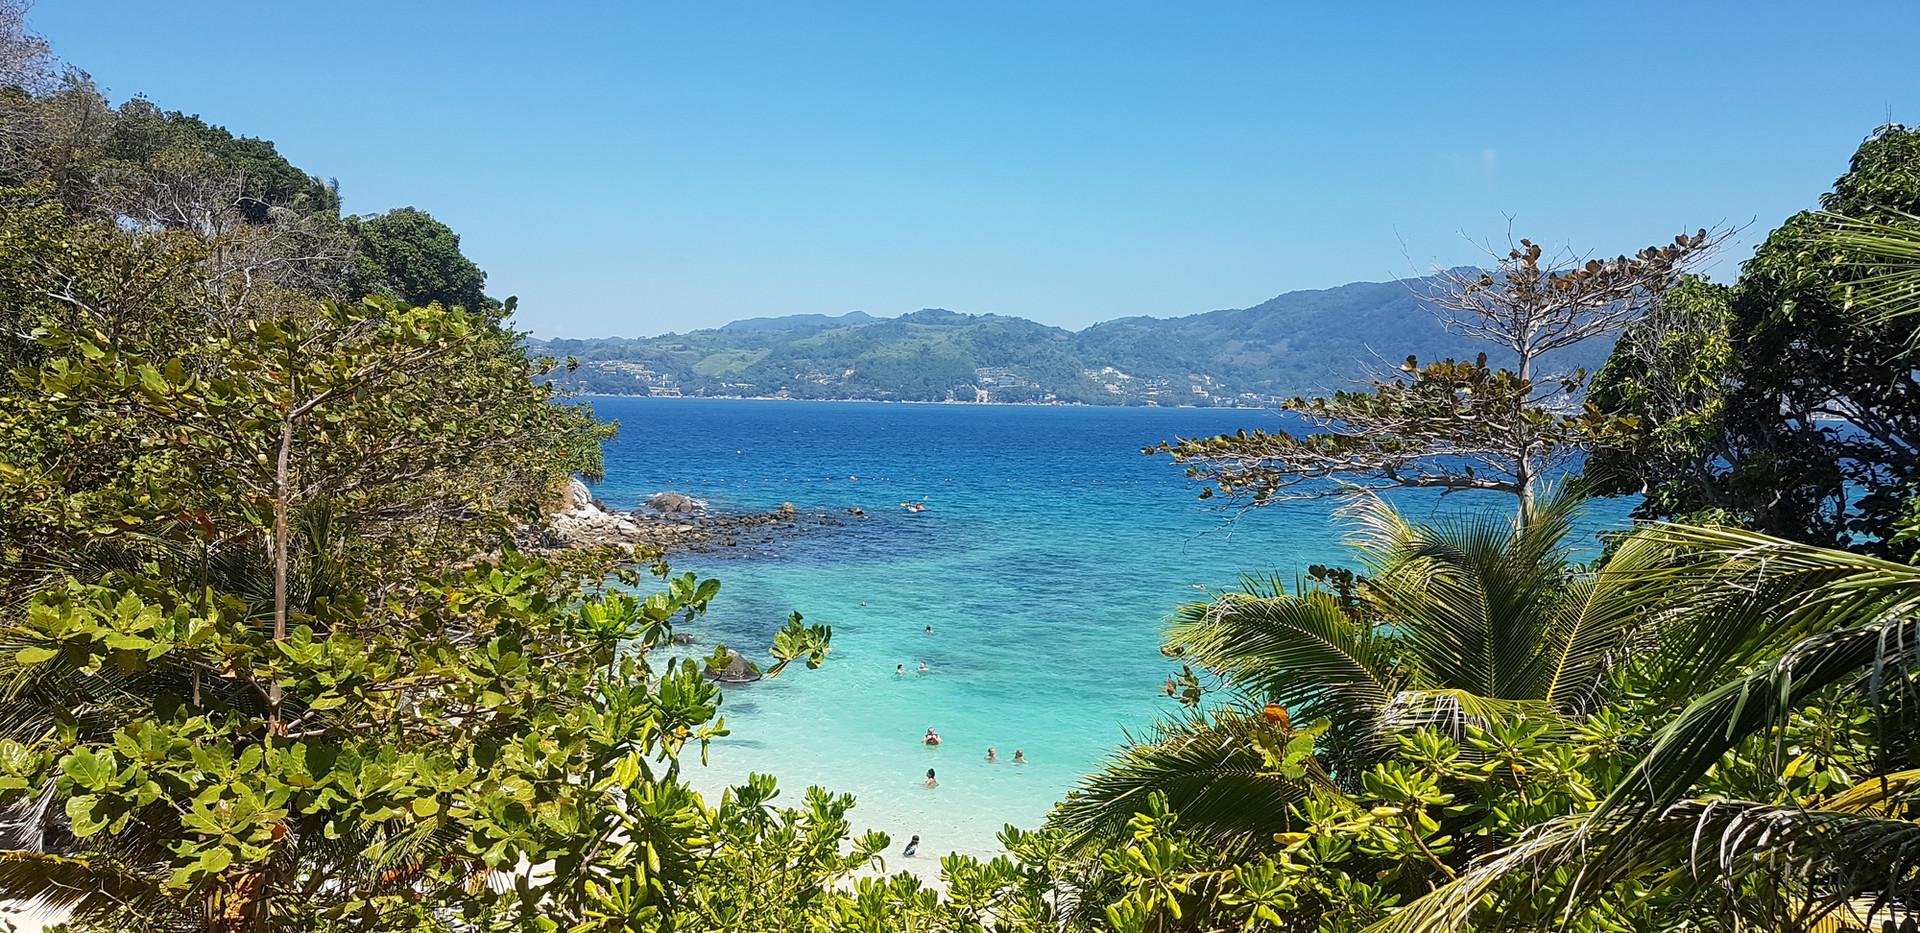 Paradise beach!